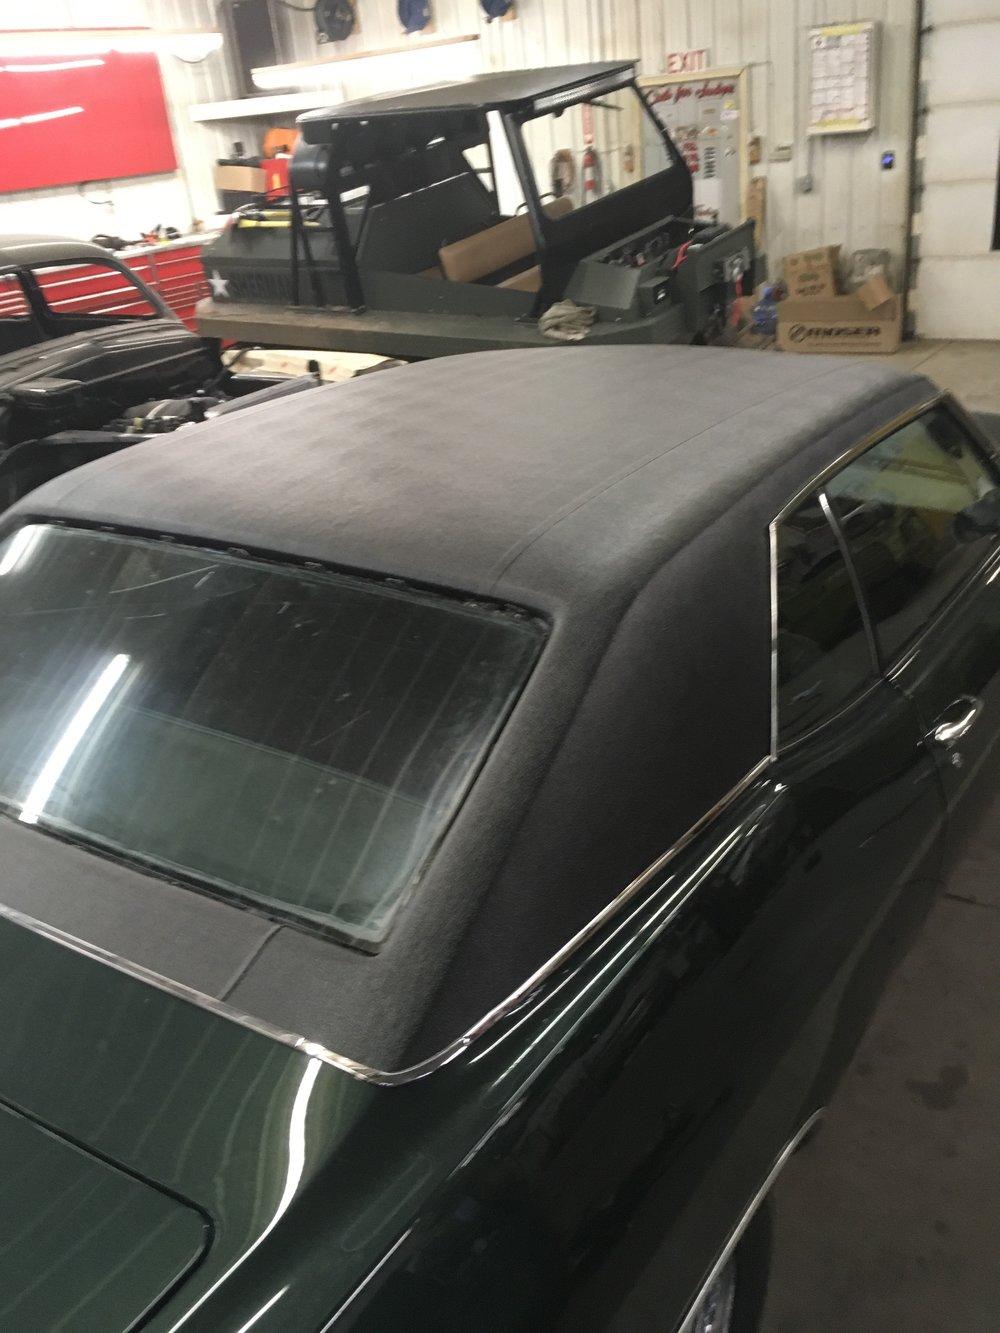 1970-impala-minneapolis-car-restoration-hot-rod-factory-exterior-new-paint.jpg